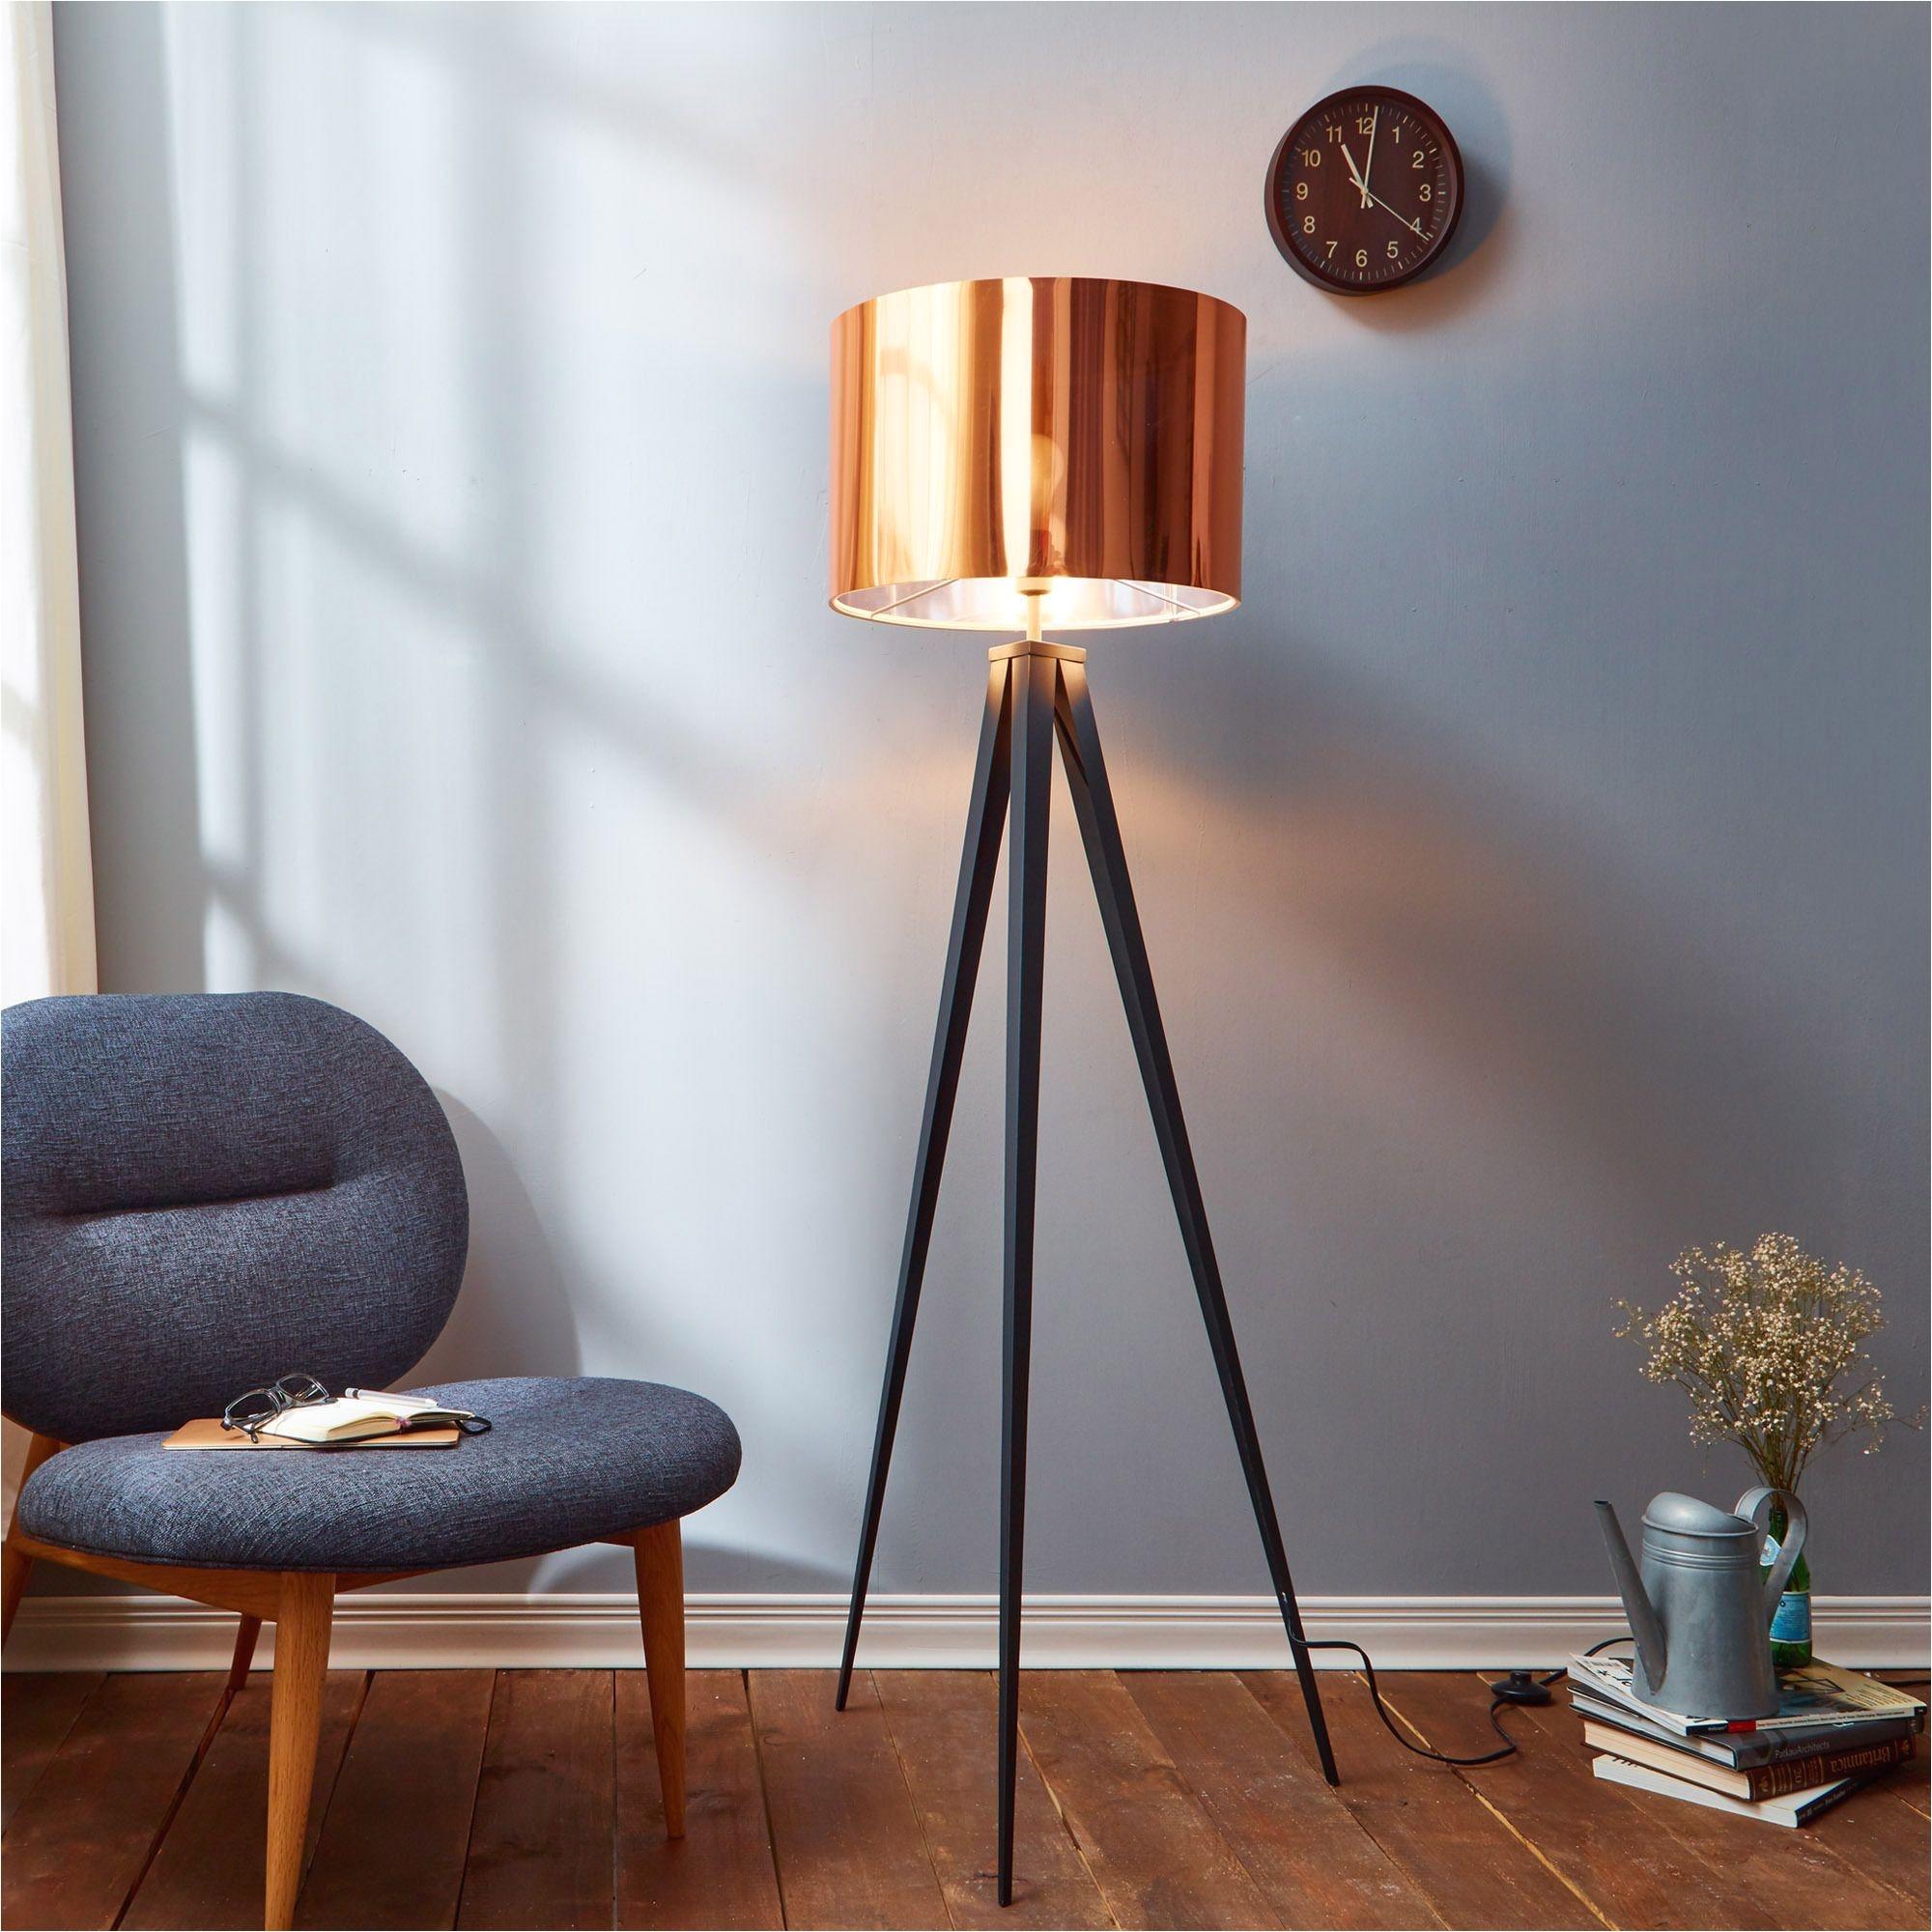 Crate and Barrel Stilt Floor Mirror Versanora Romanza TriPod Floor Lamp with Copper Brown Shade